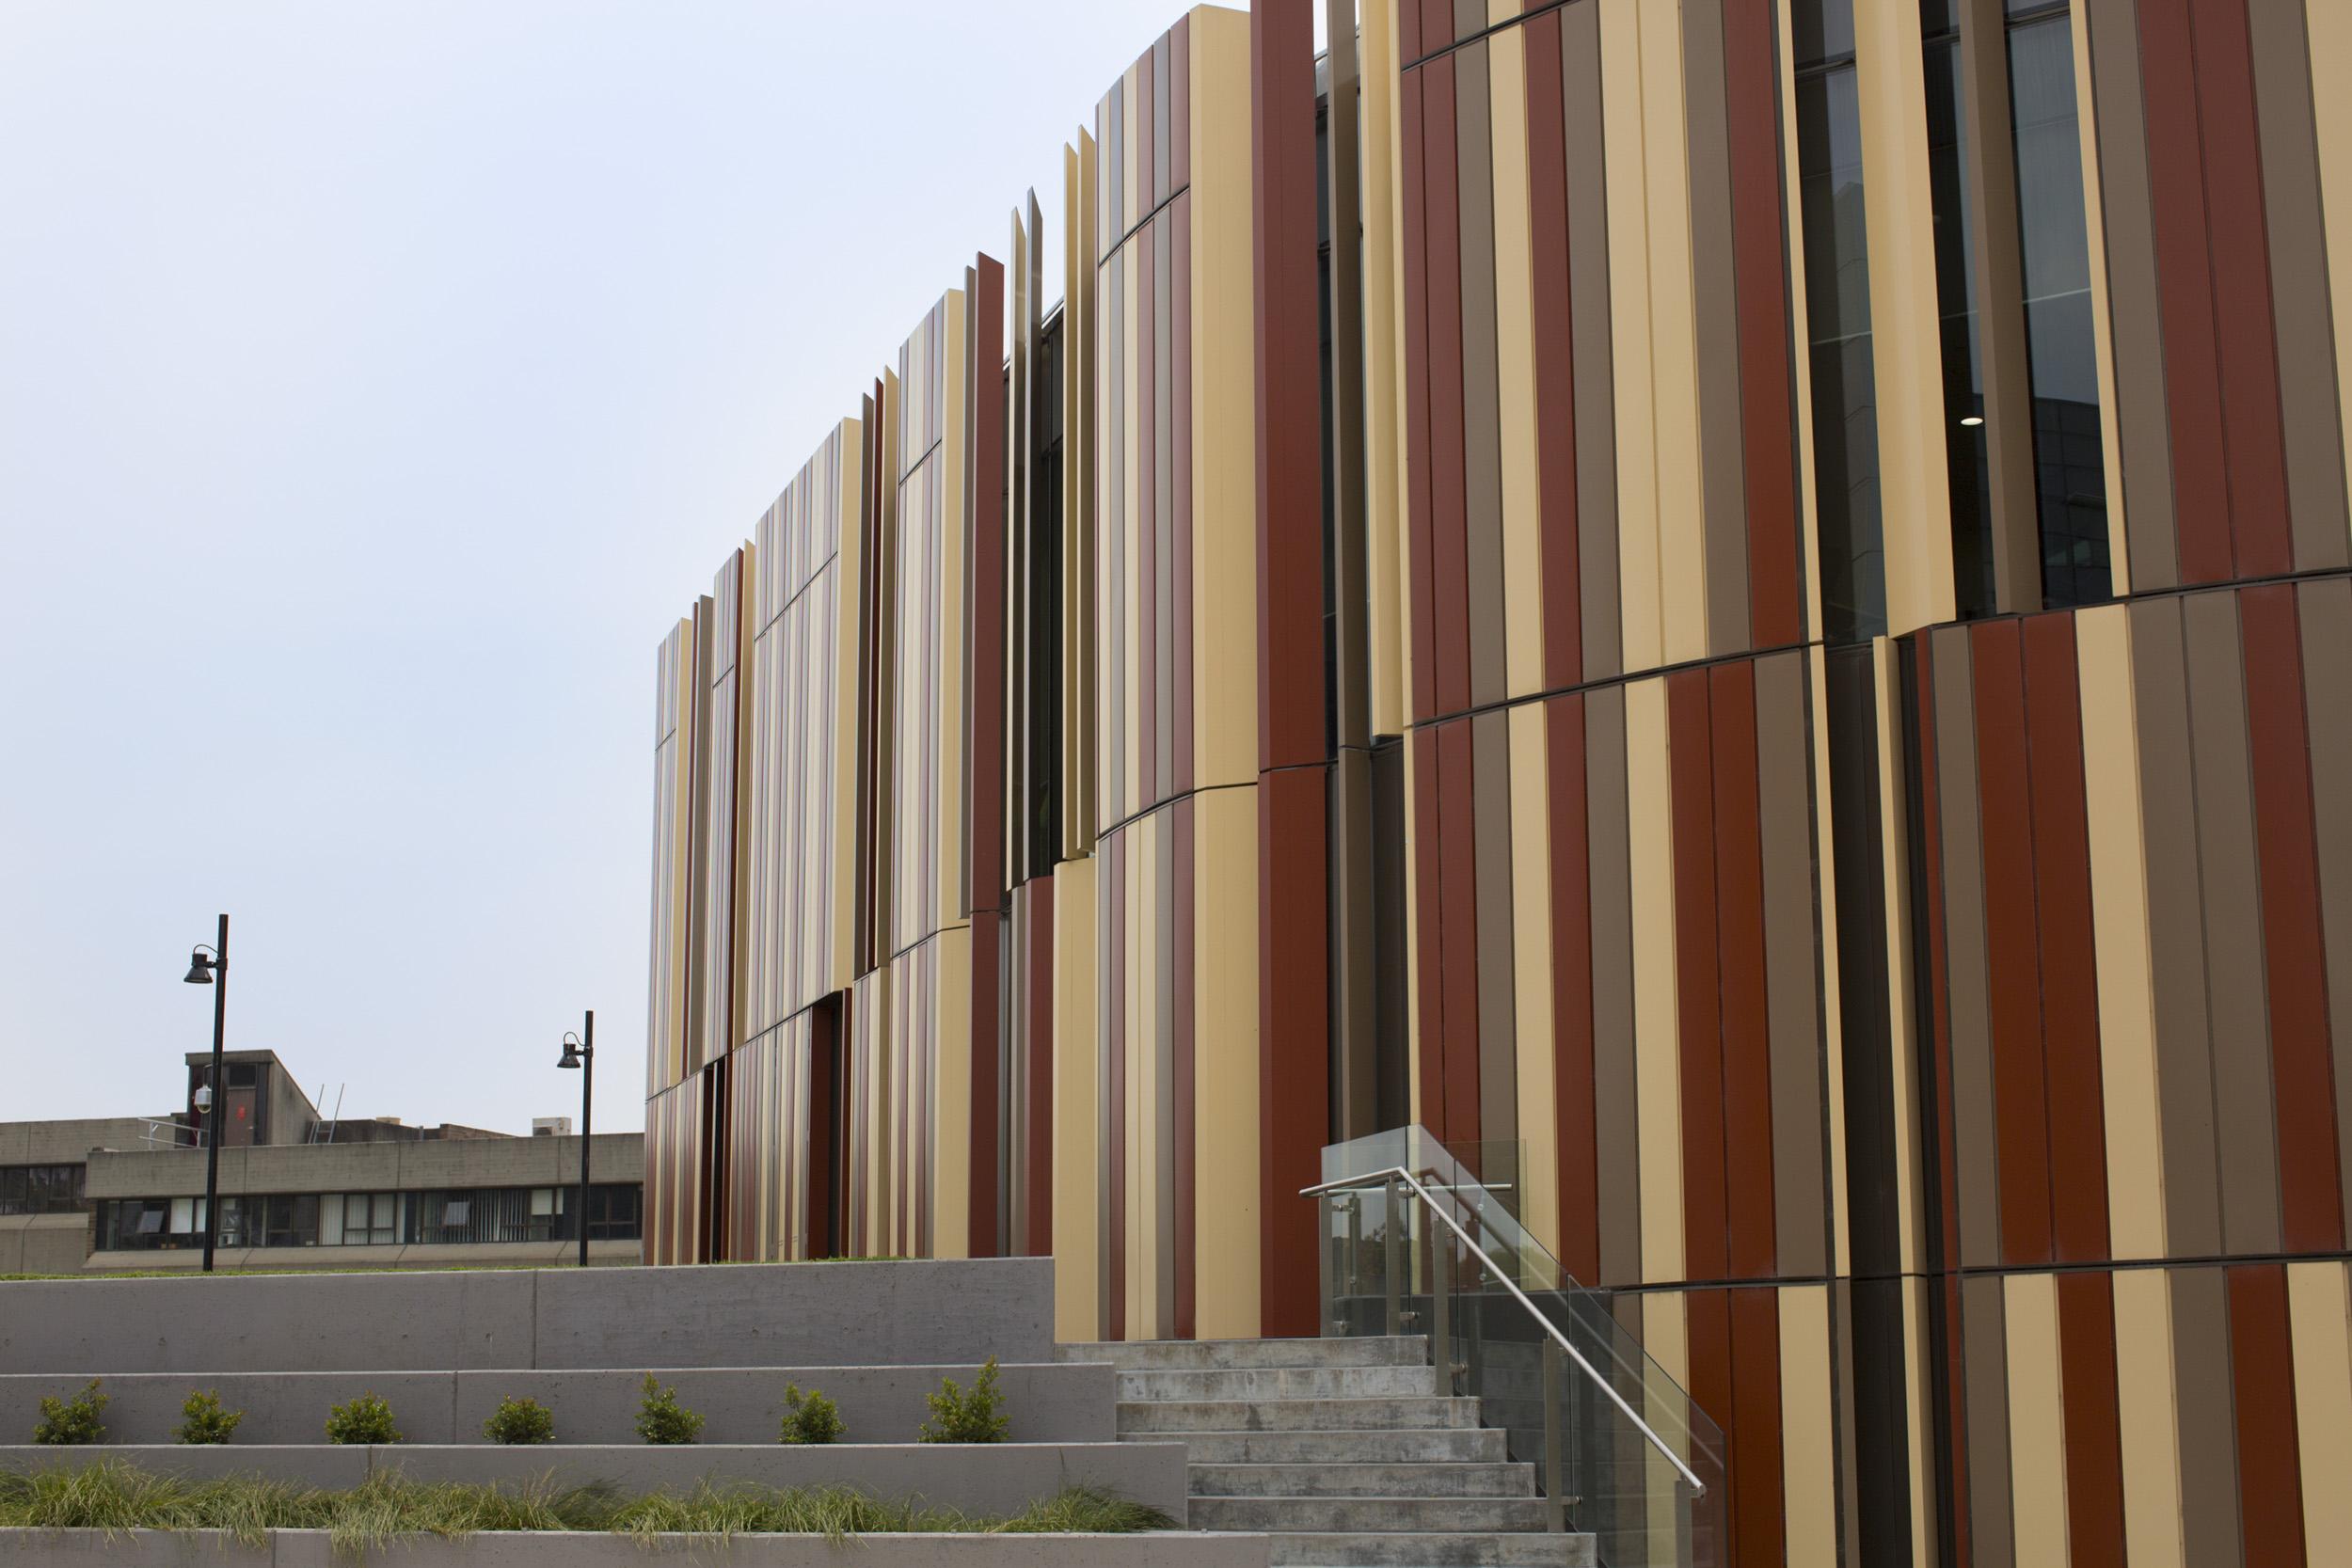 Educational-architecture-Sydney_04.jpg